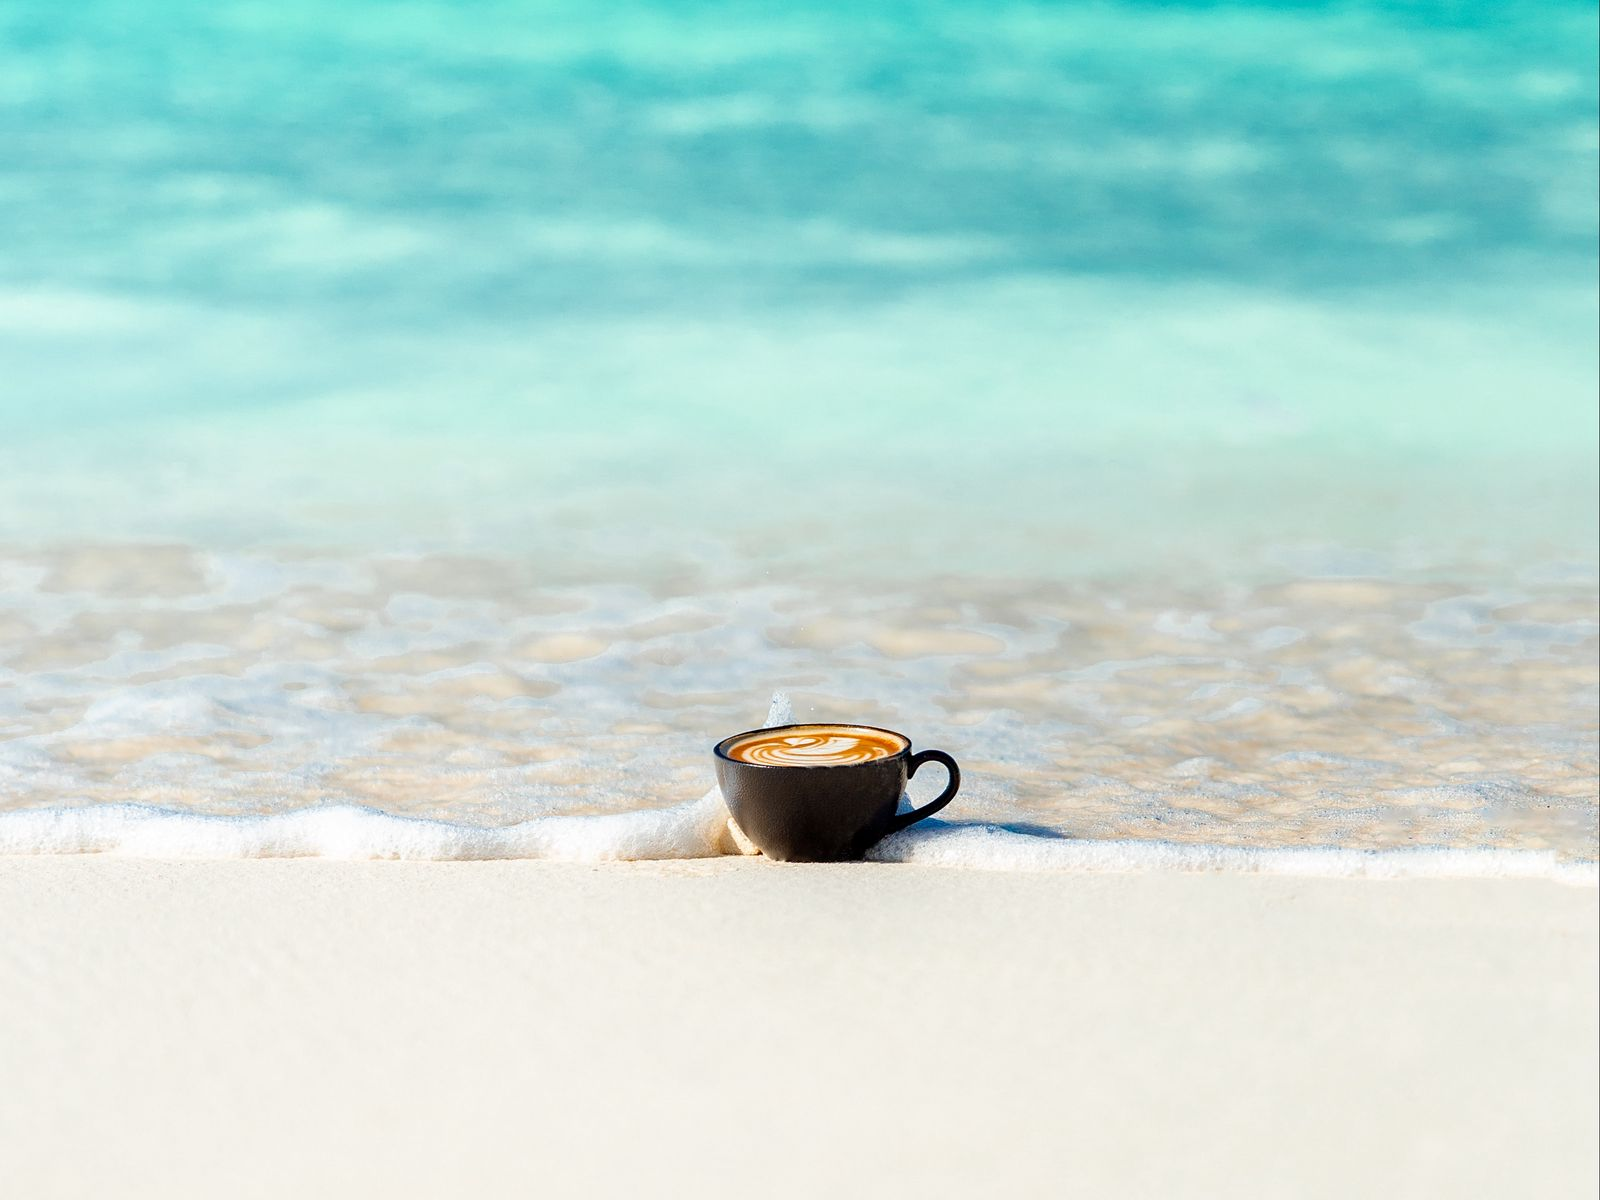 1600x1200 Wallpaper cup, ocean, sand, coast, minimalism